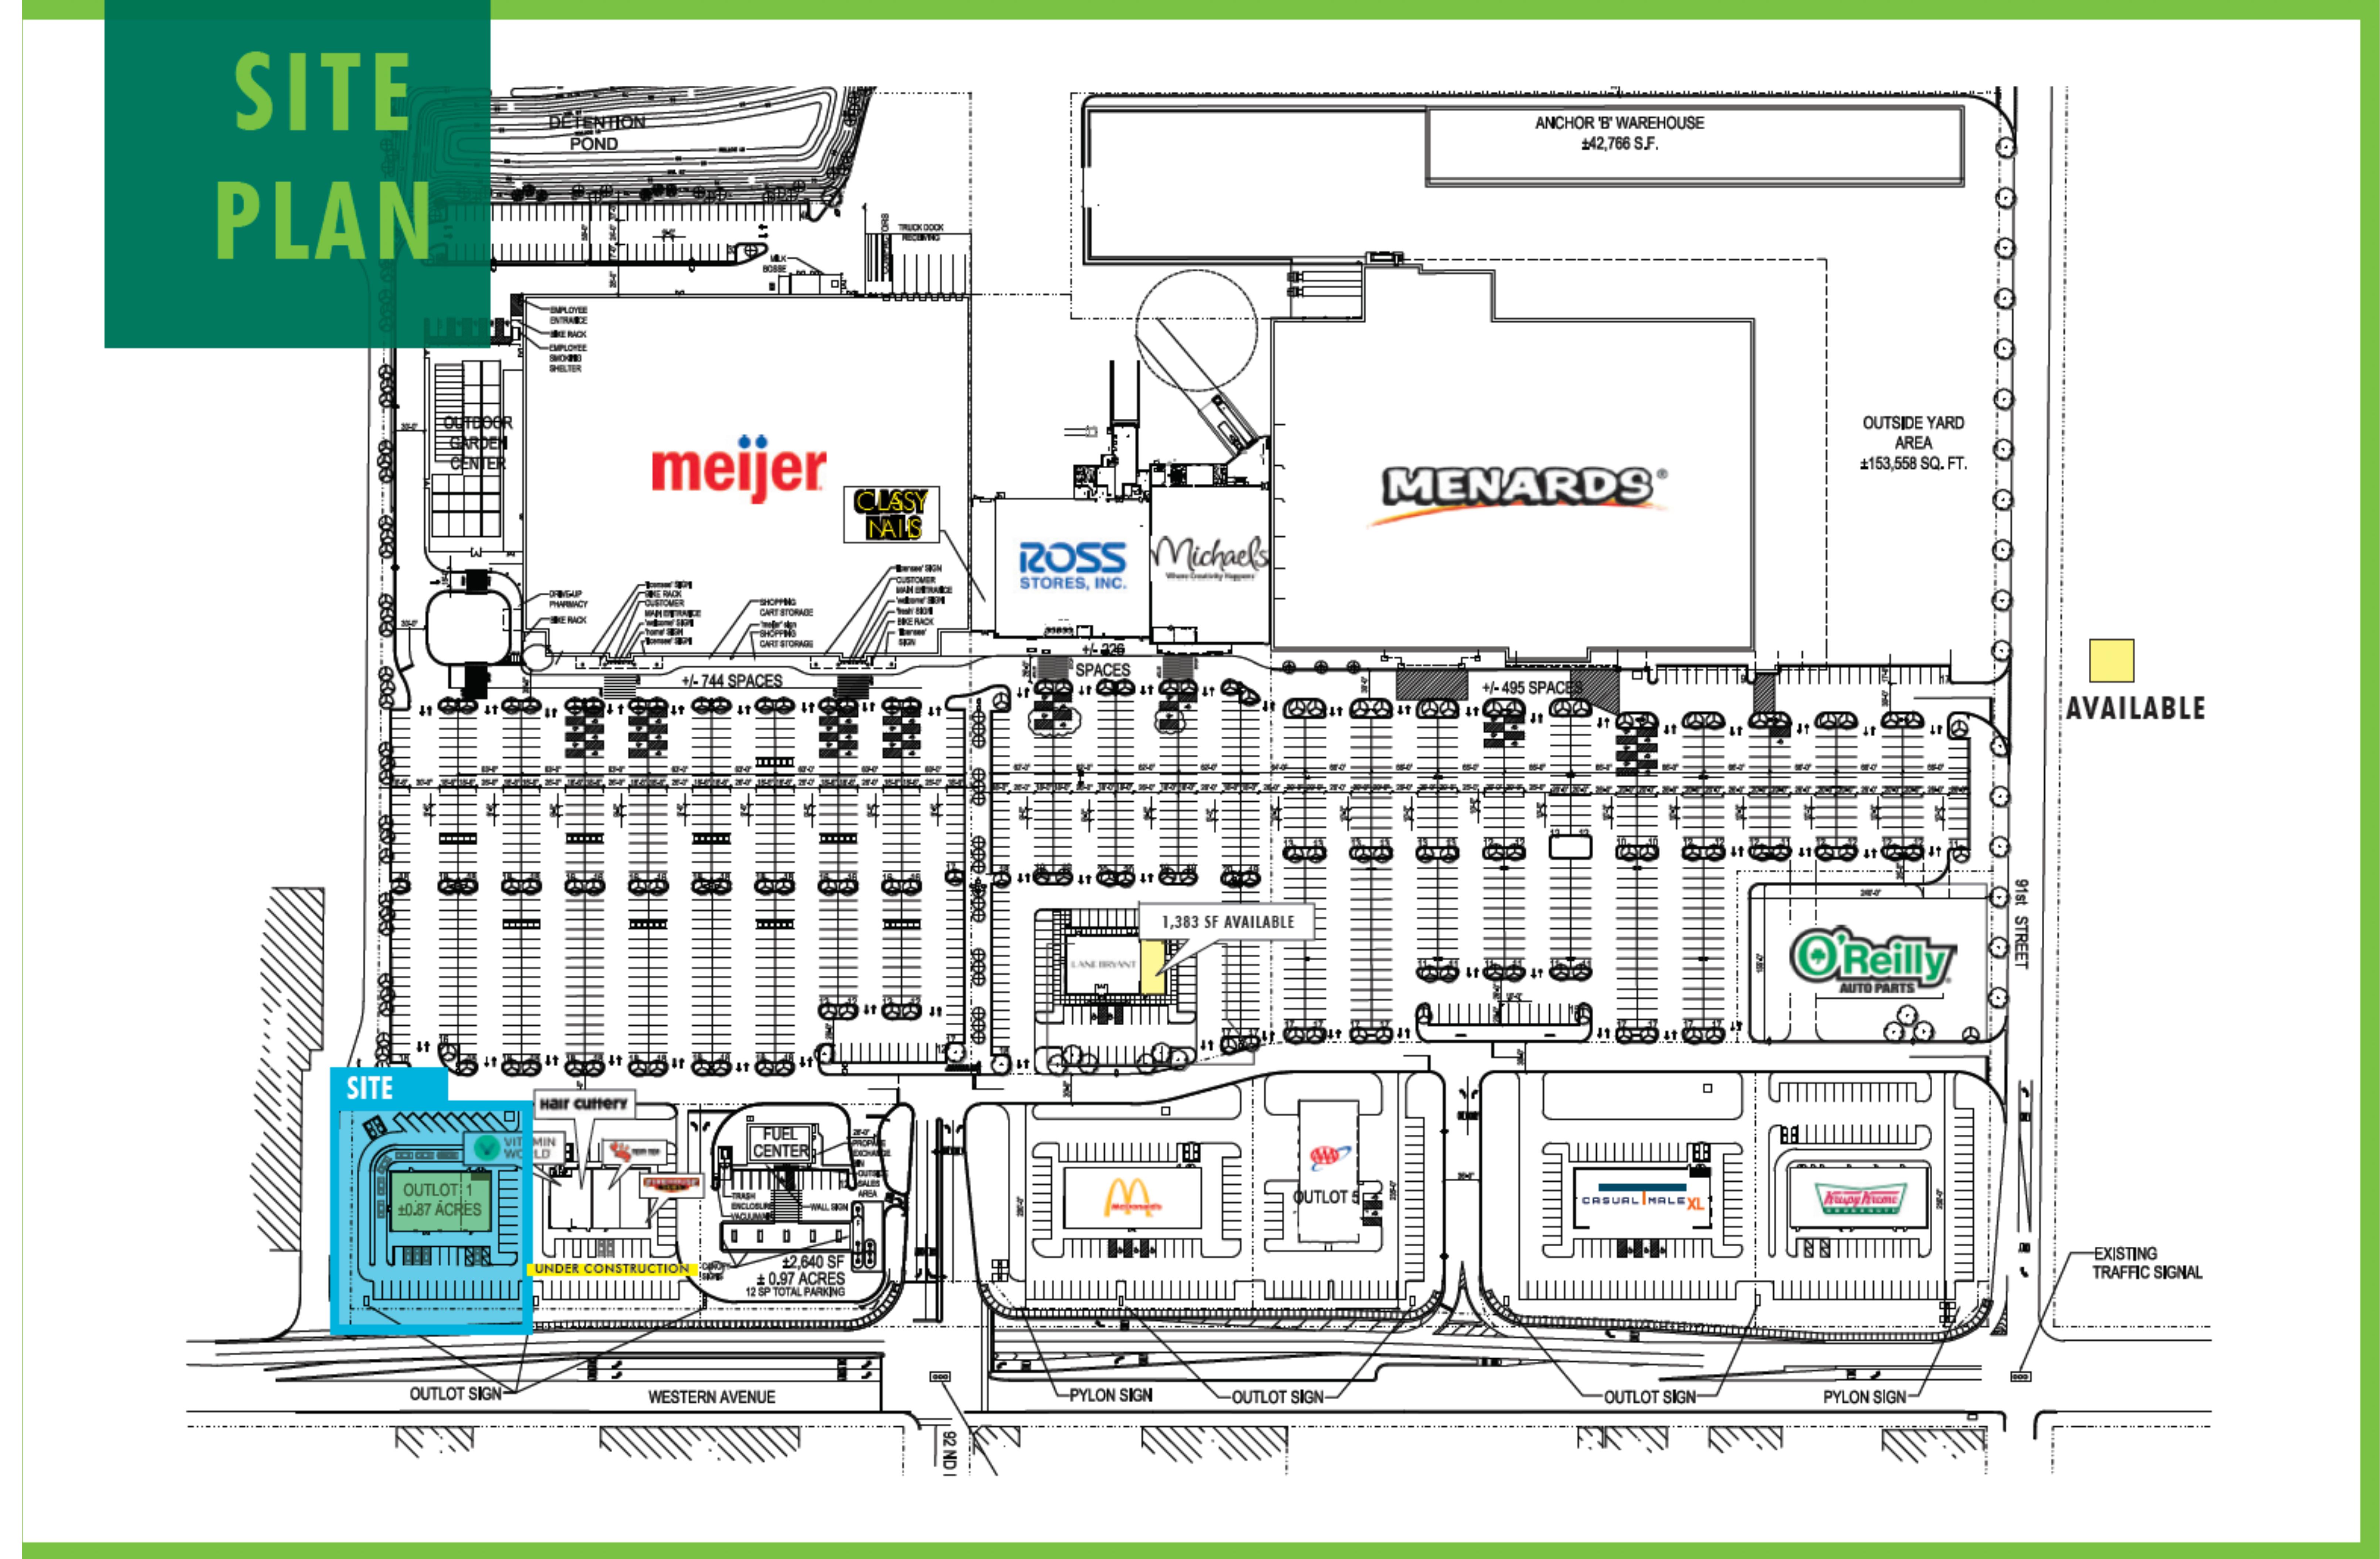 Evergreen Marketplace: site plan